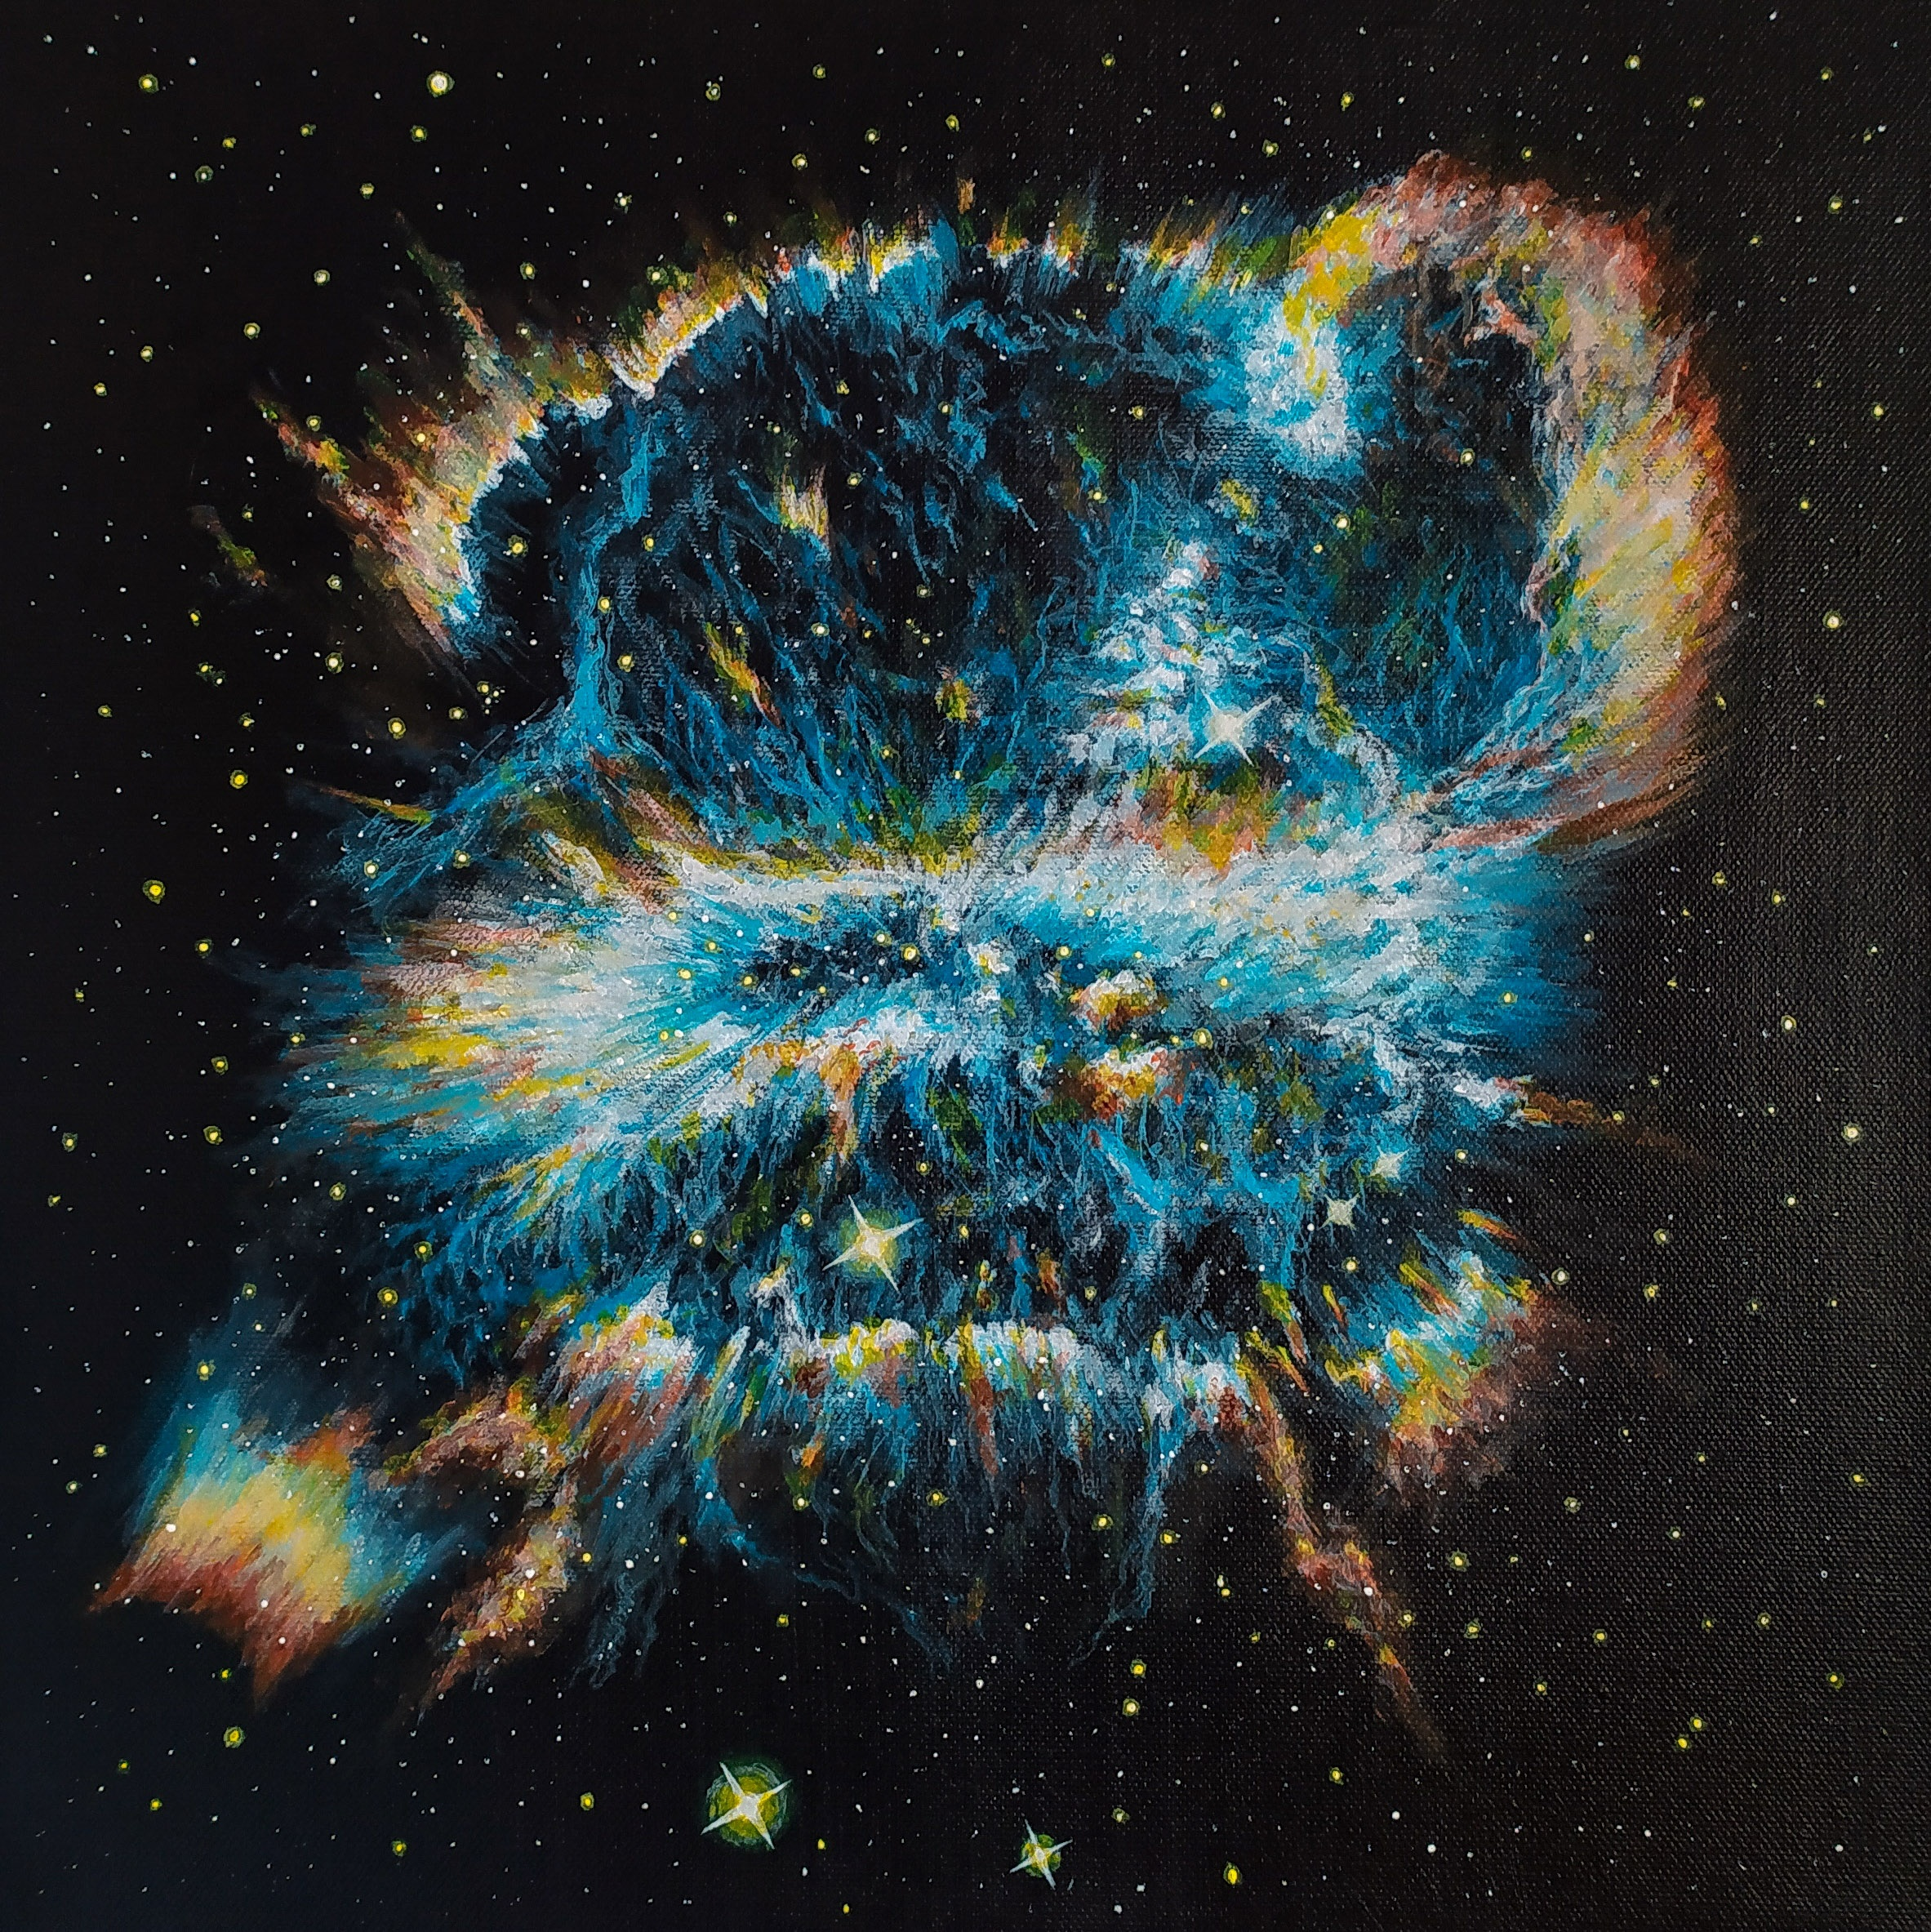 NGC 5189 30x30 cm